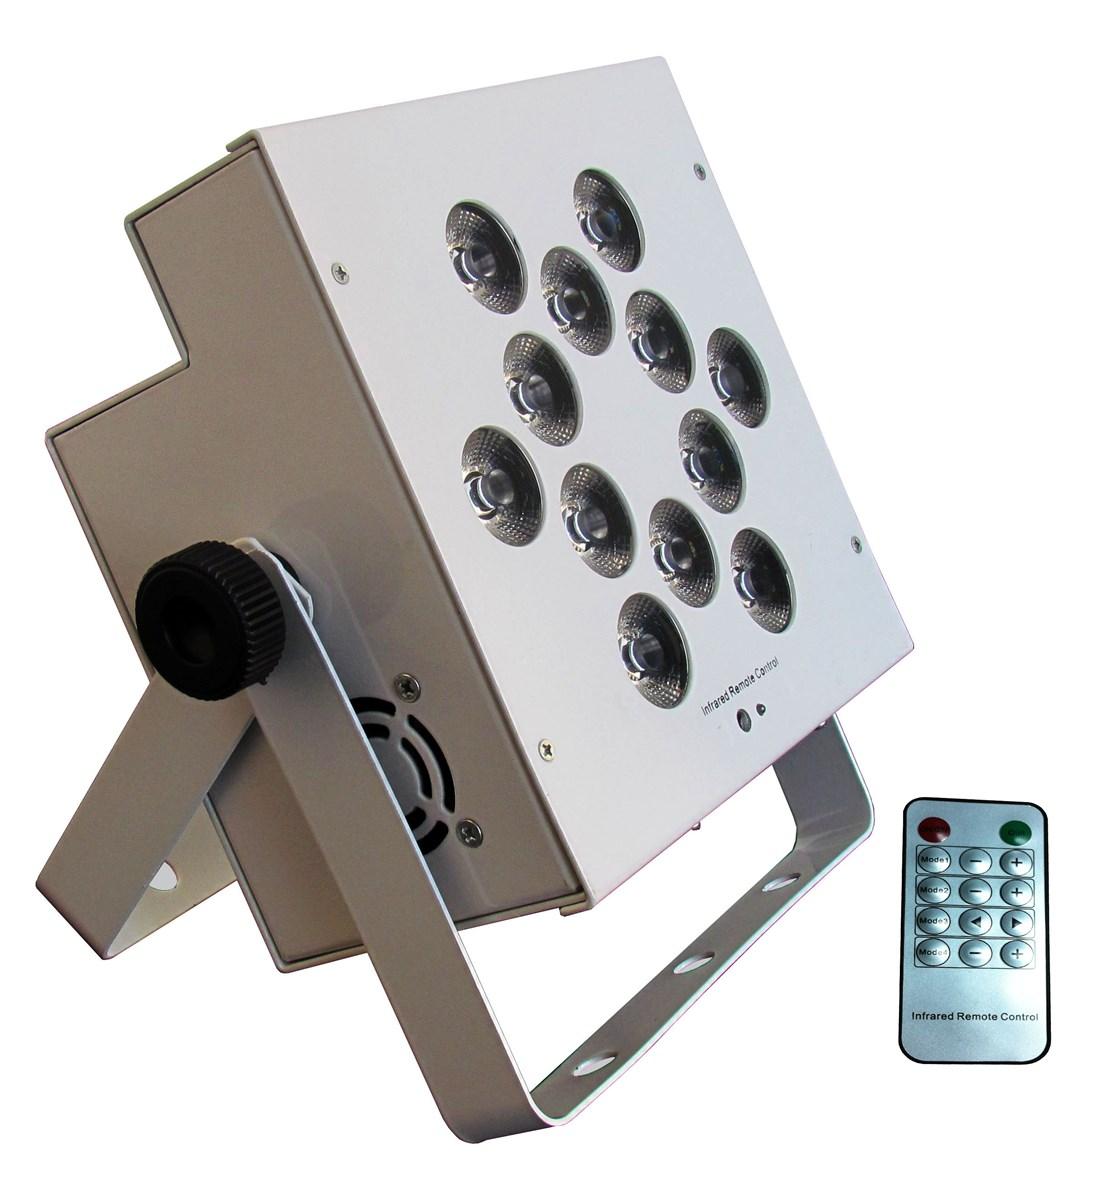 Rasha Hot Sale 12pcs18W 6in1 RGBAW UV Battery Powered Wireless LED Par Light with Remote Control Stage Light